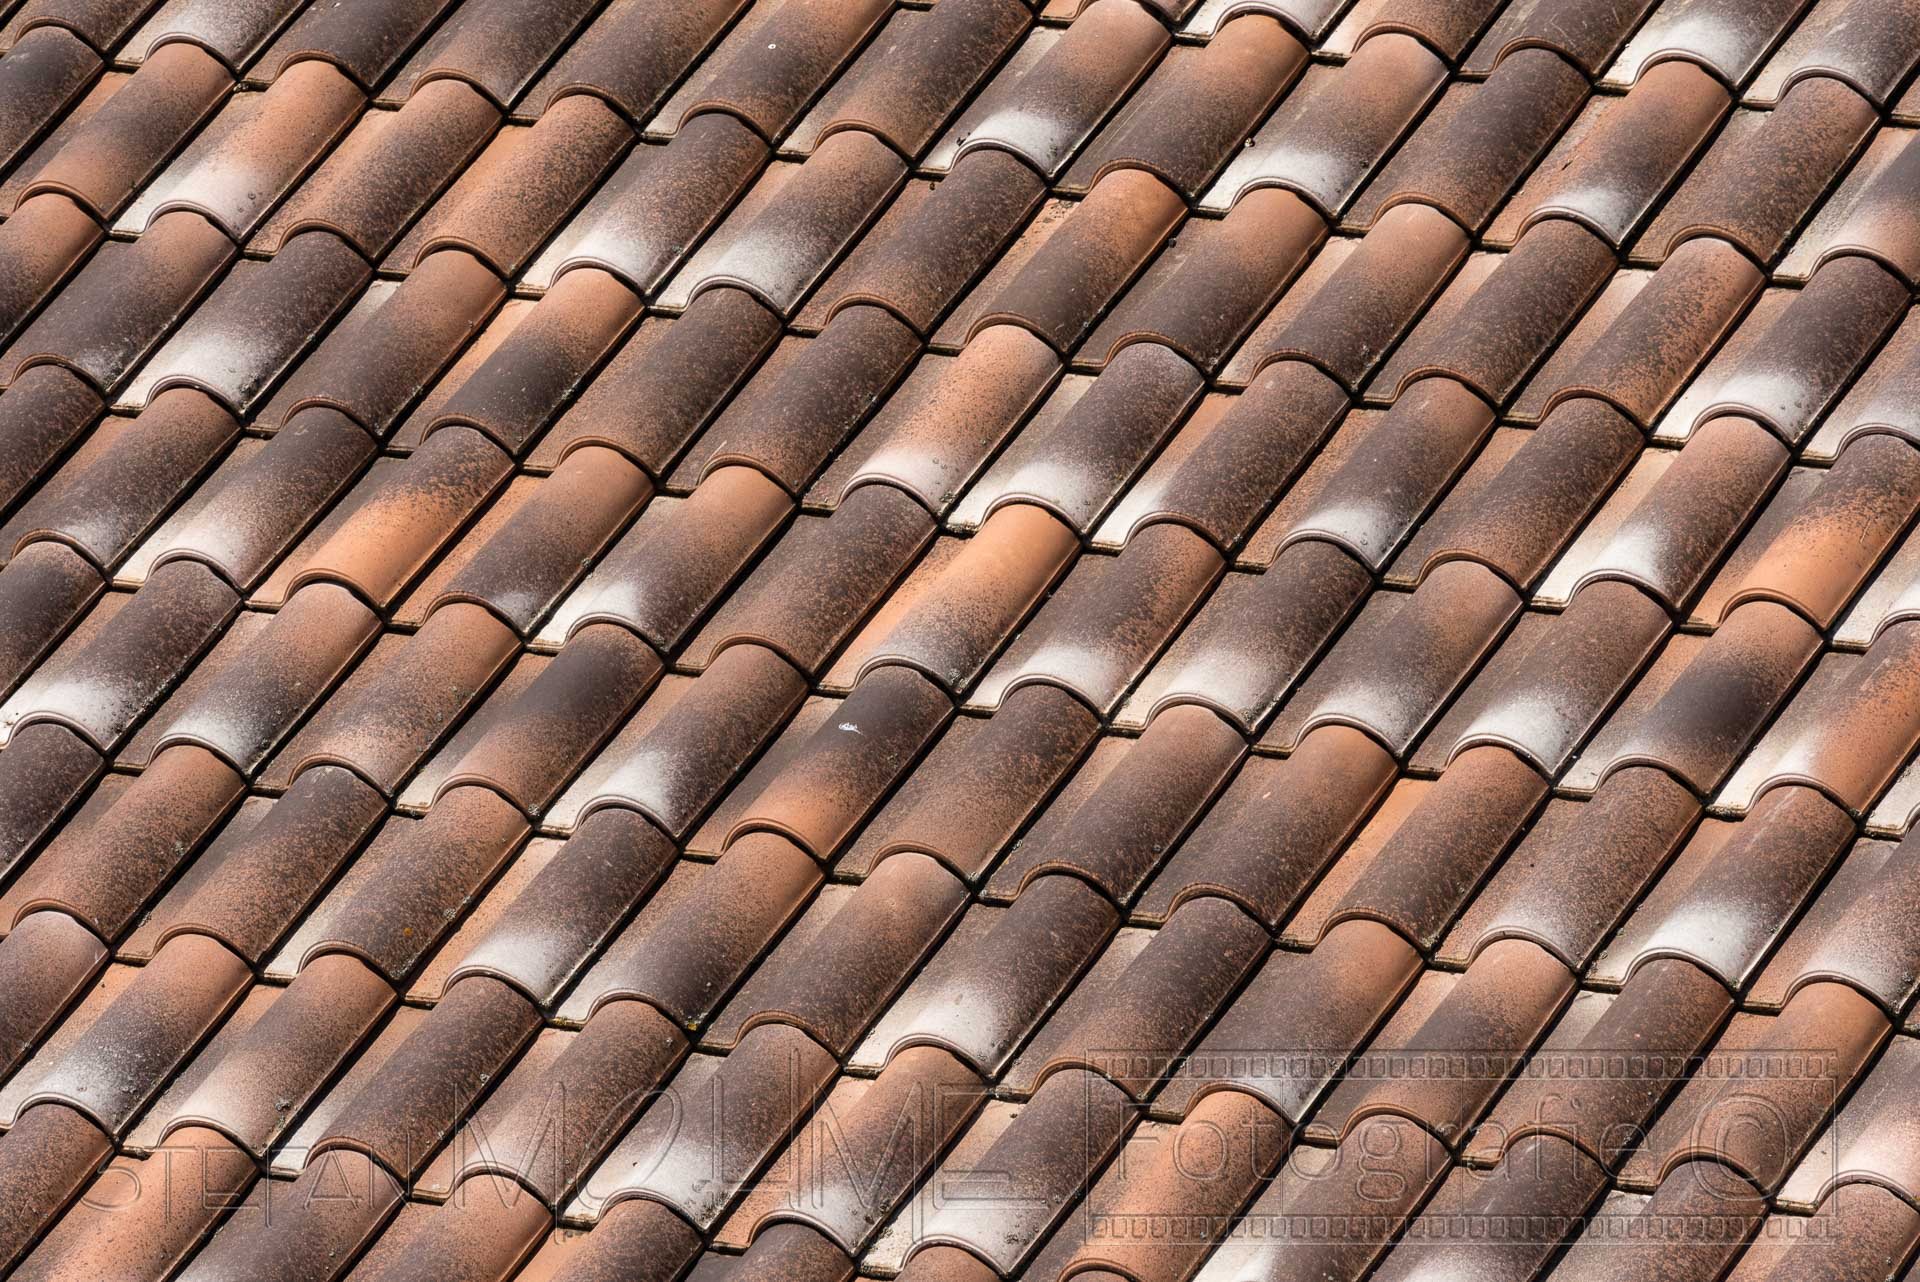 dach,dachziegel,struktur,muster,oberflaeche,braun,nahaufnahme